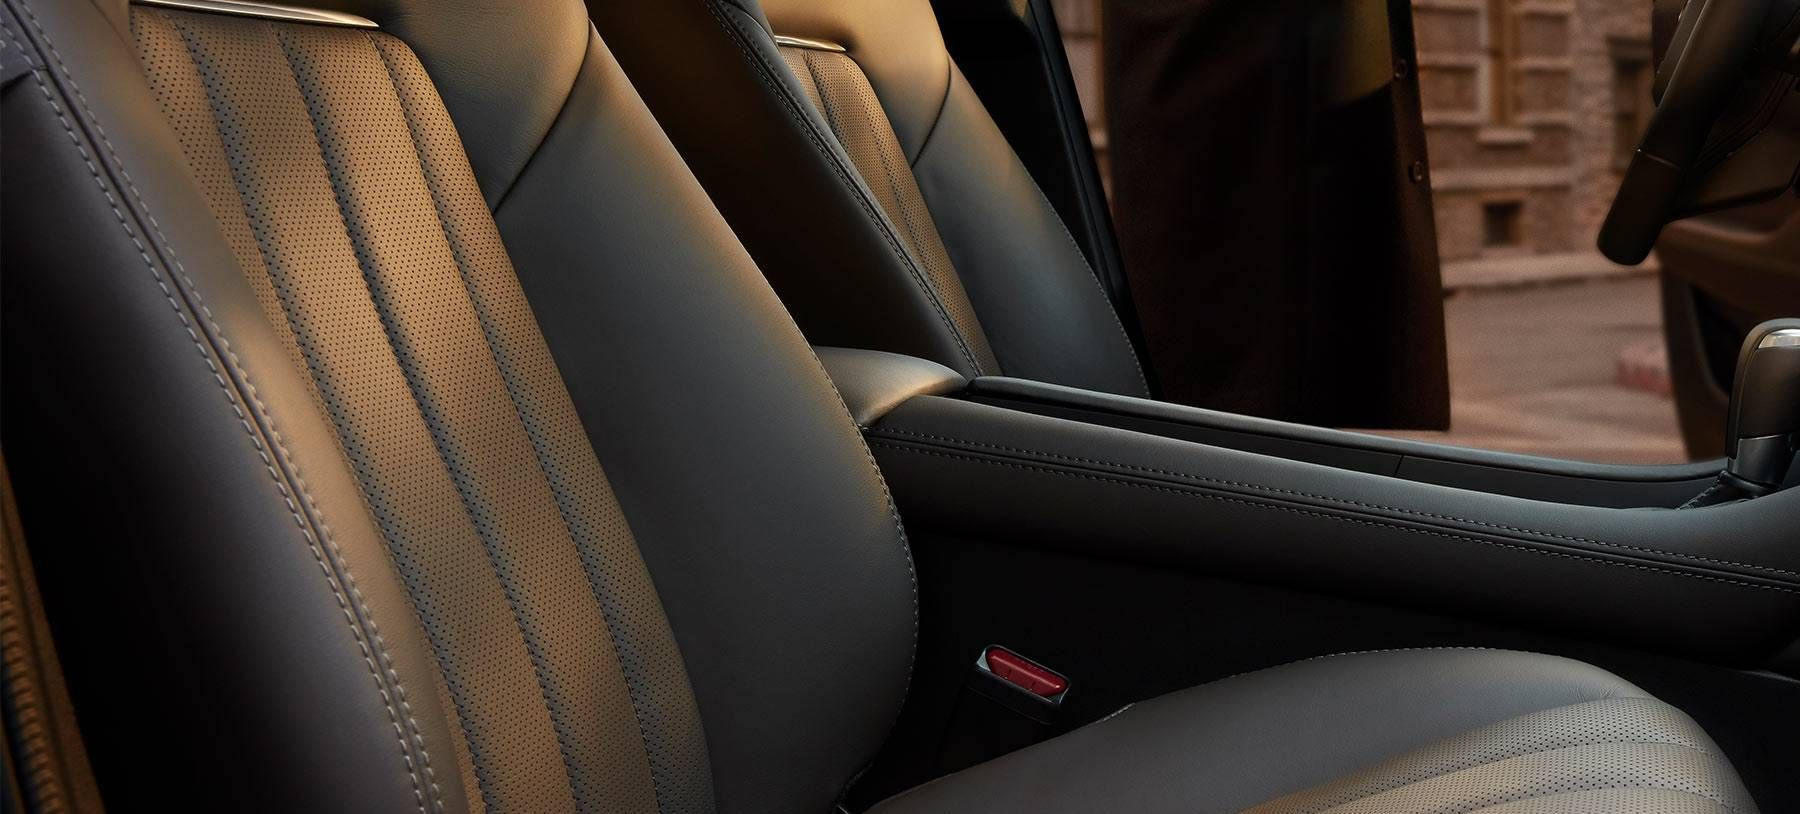 Plush Seating in the Mazda6